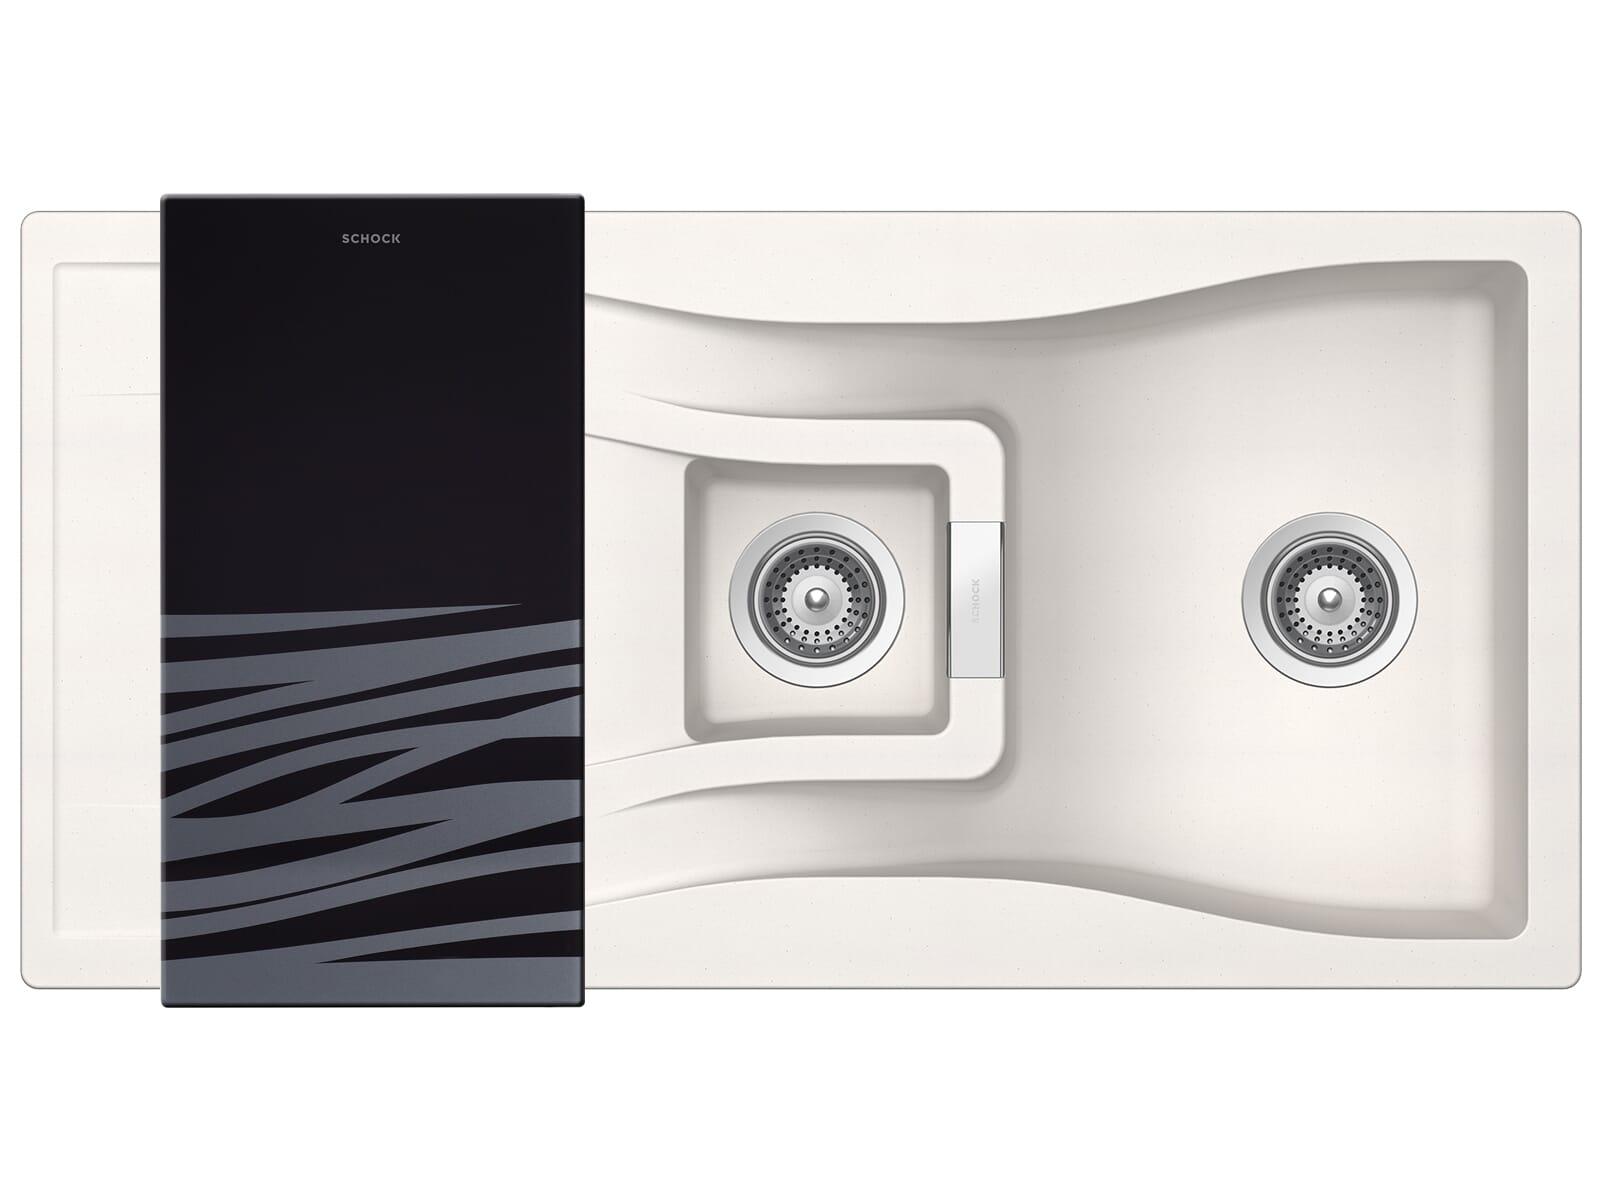 Schock Waterfall D-150 A Polaris - WATD150APOL Granitspüle